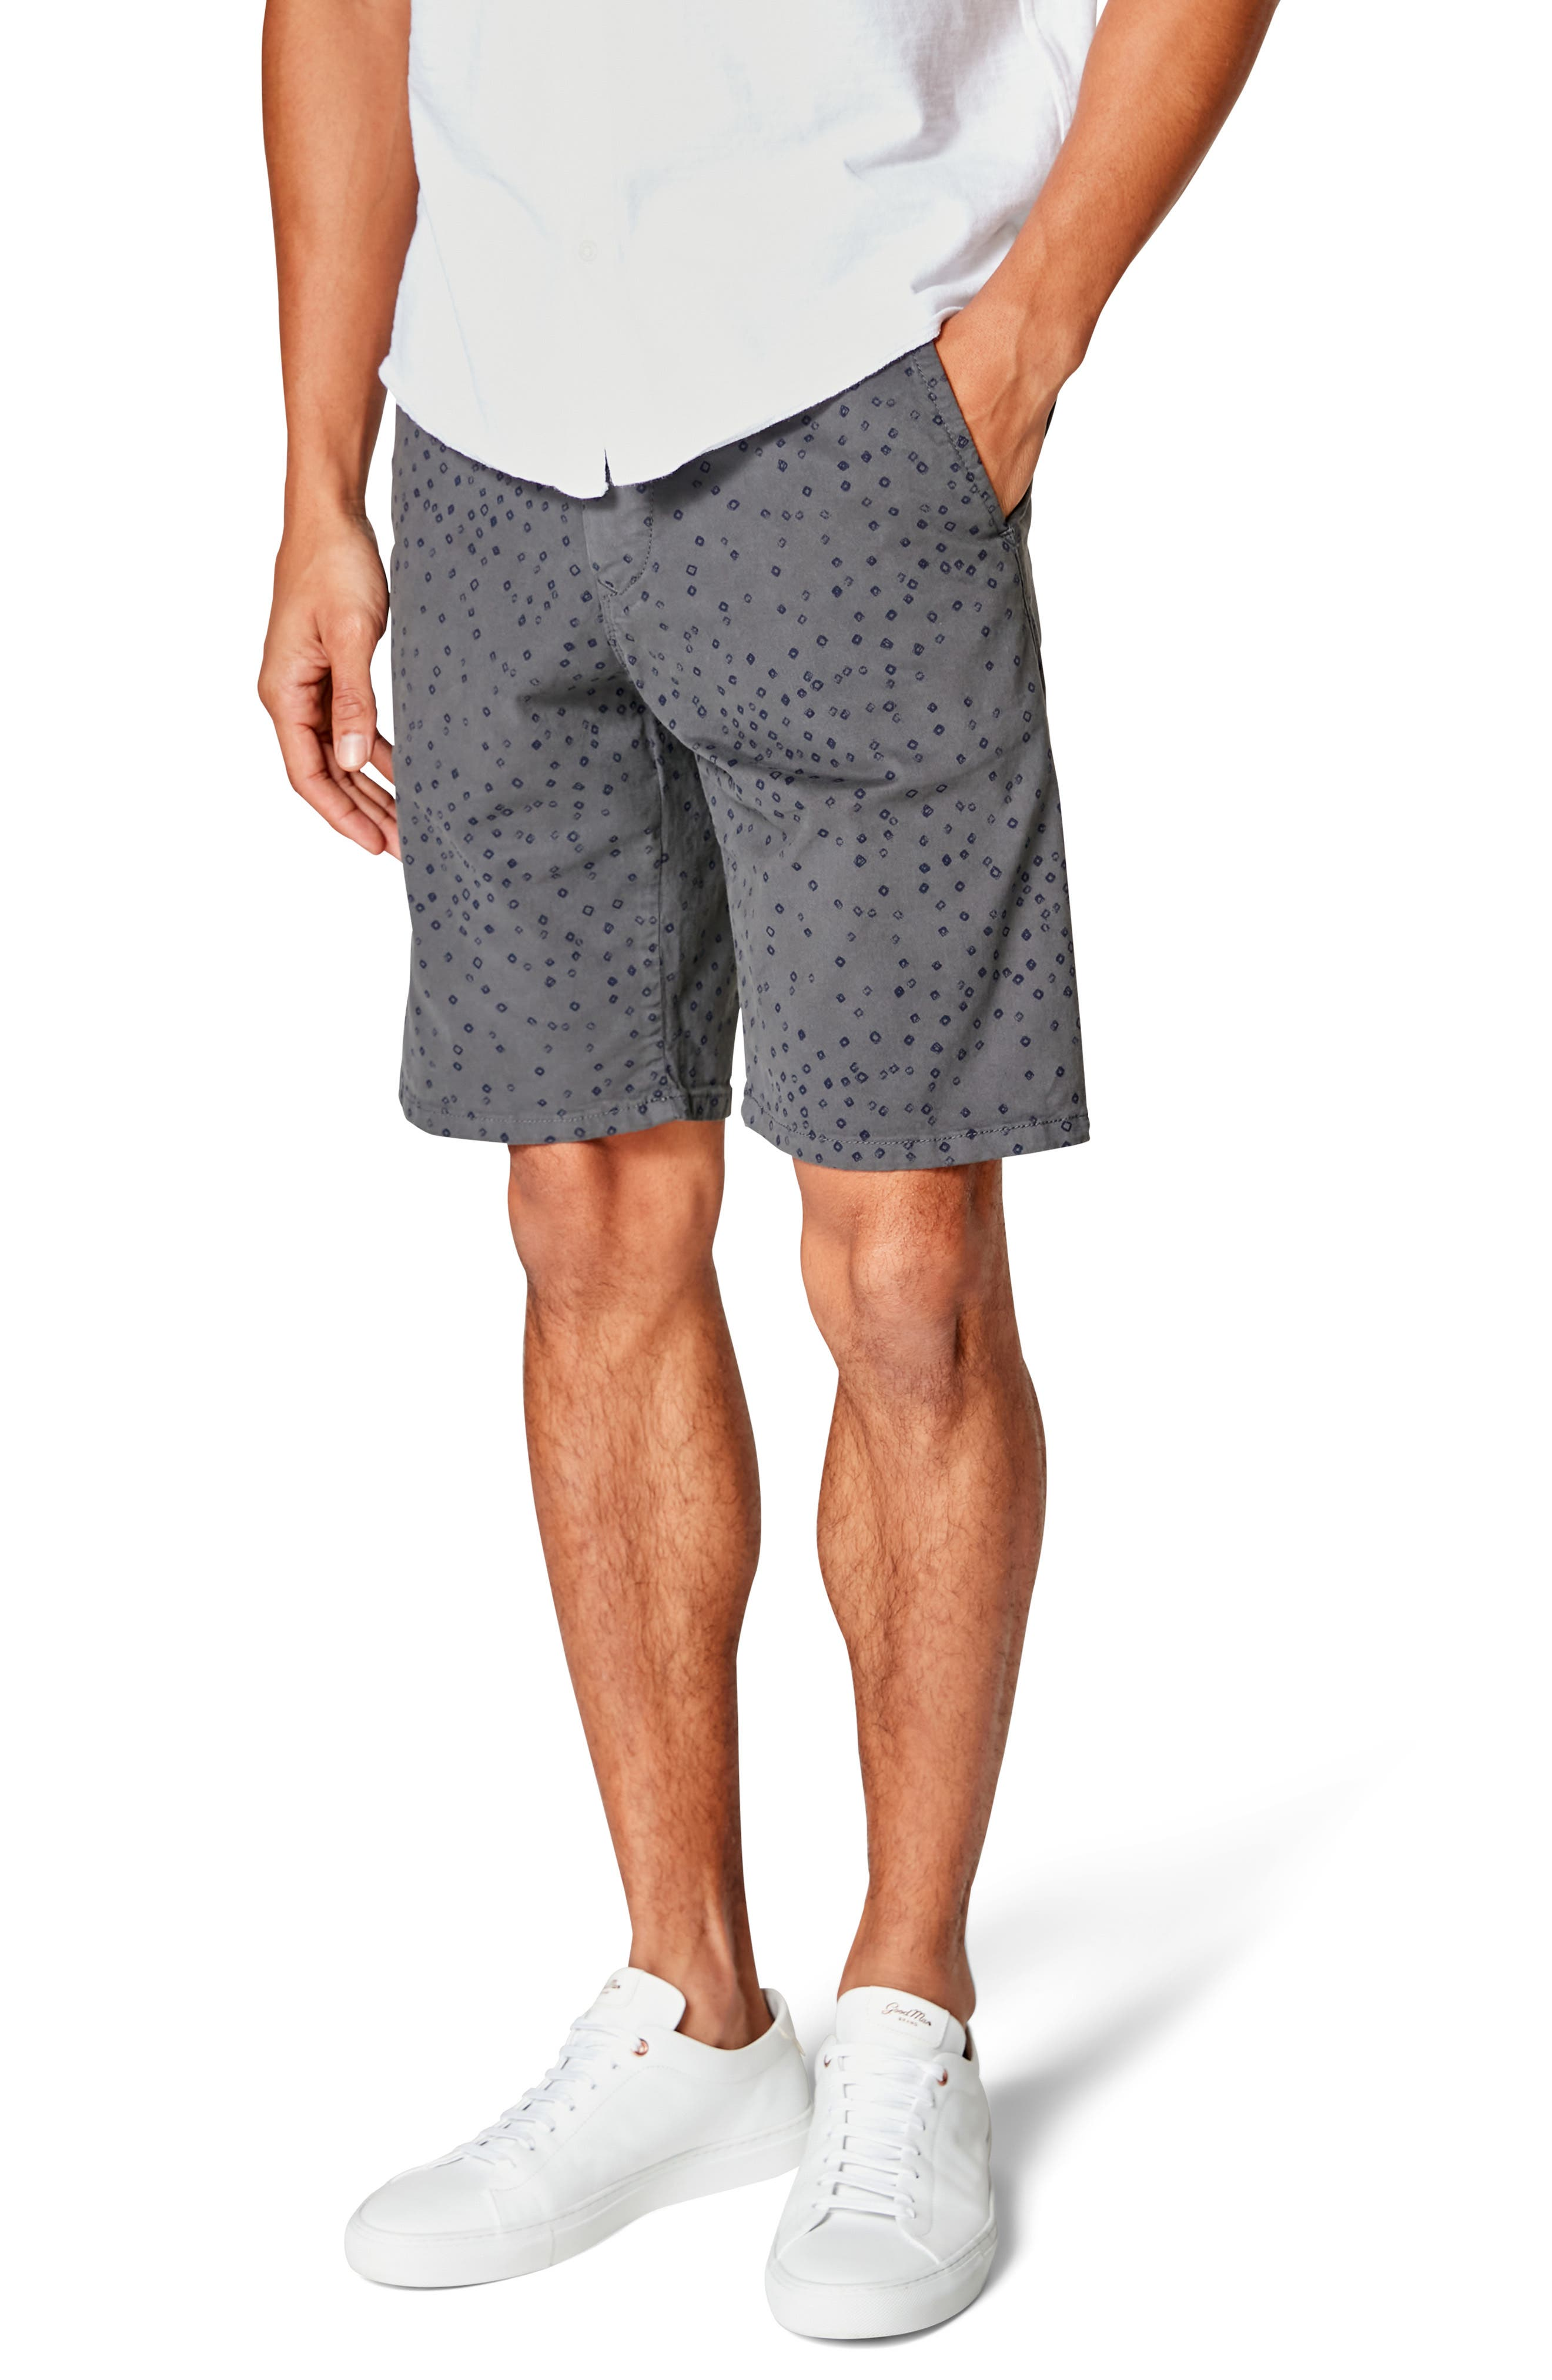 Image of Good Man Brand Monaco Slim Fit Flat Front Shorts